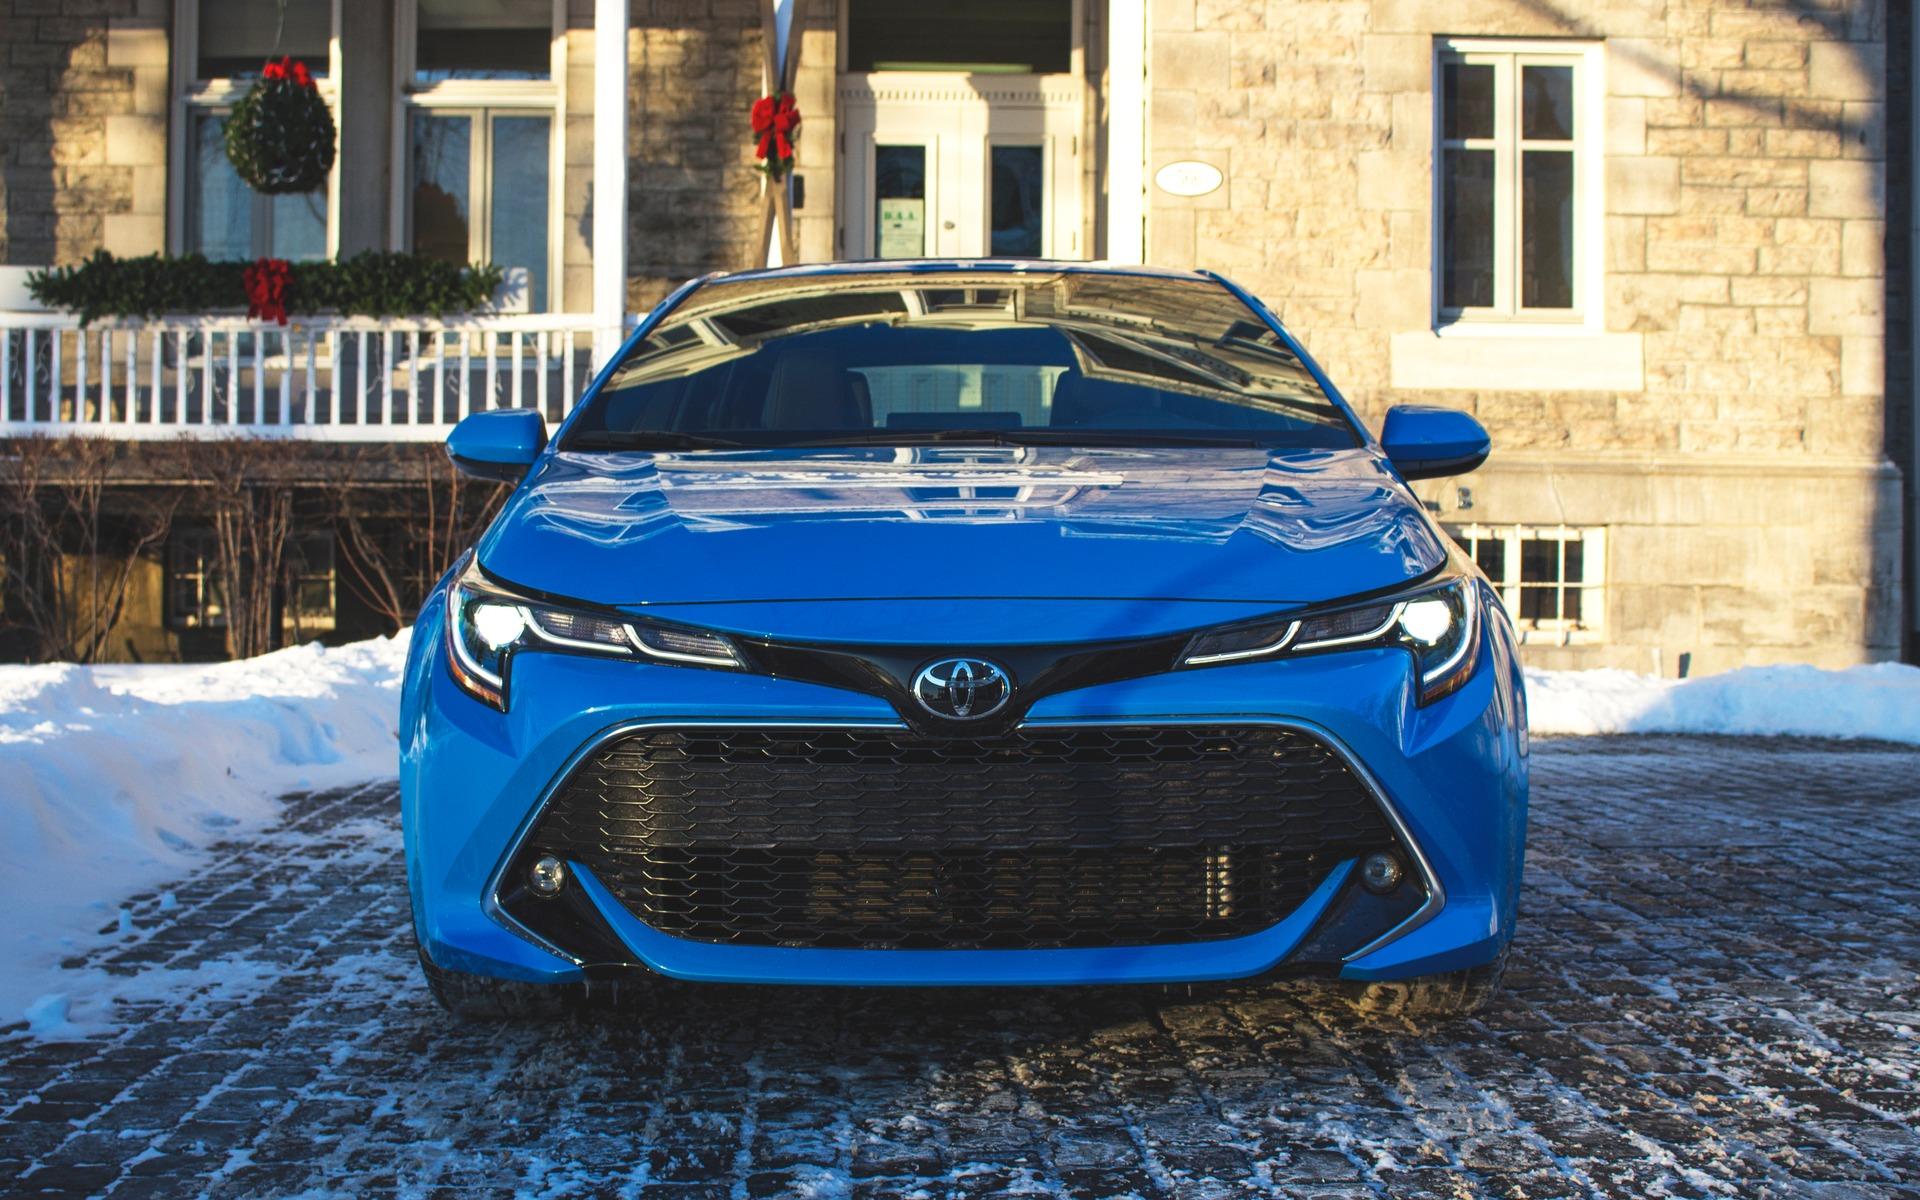 Toyota Corolla Hatchback 2019 : enfin, la Corolla que l'on a demandée! 357427_2019_Toyota_Corolla